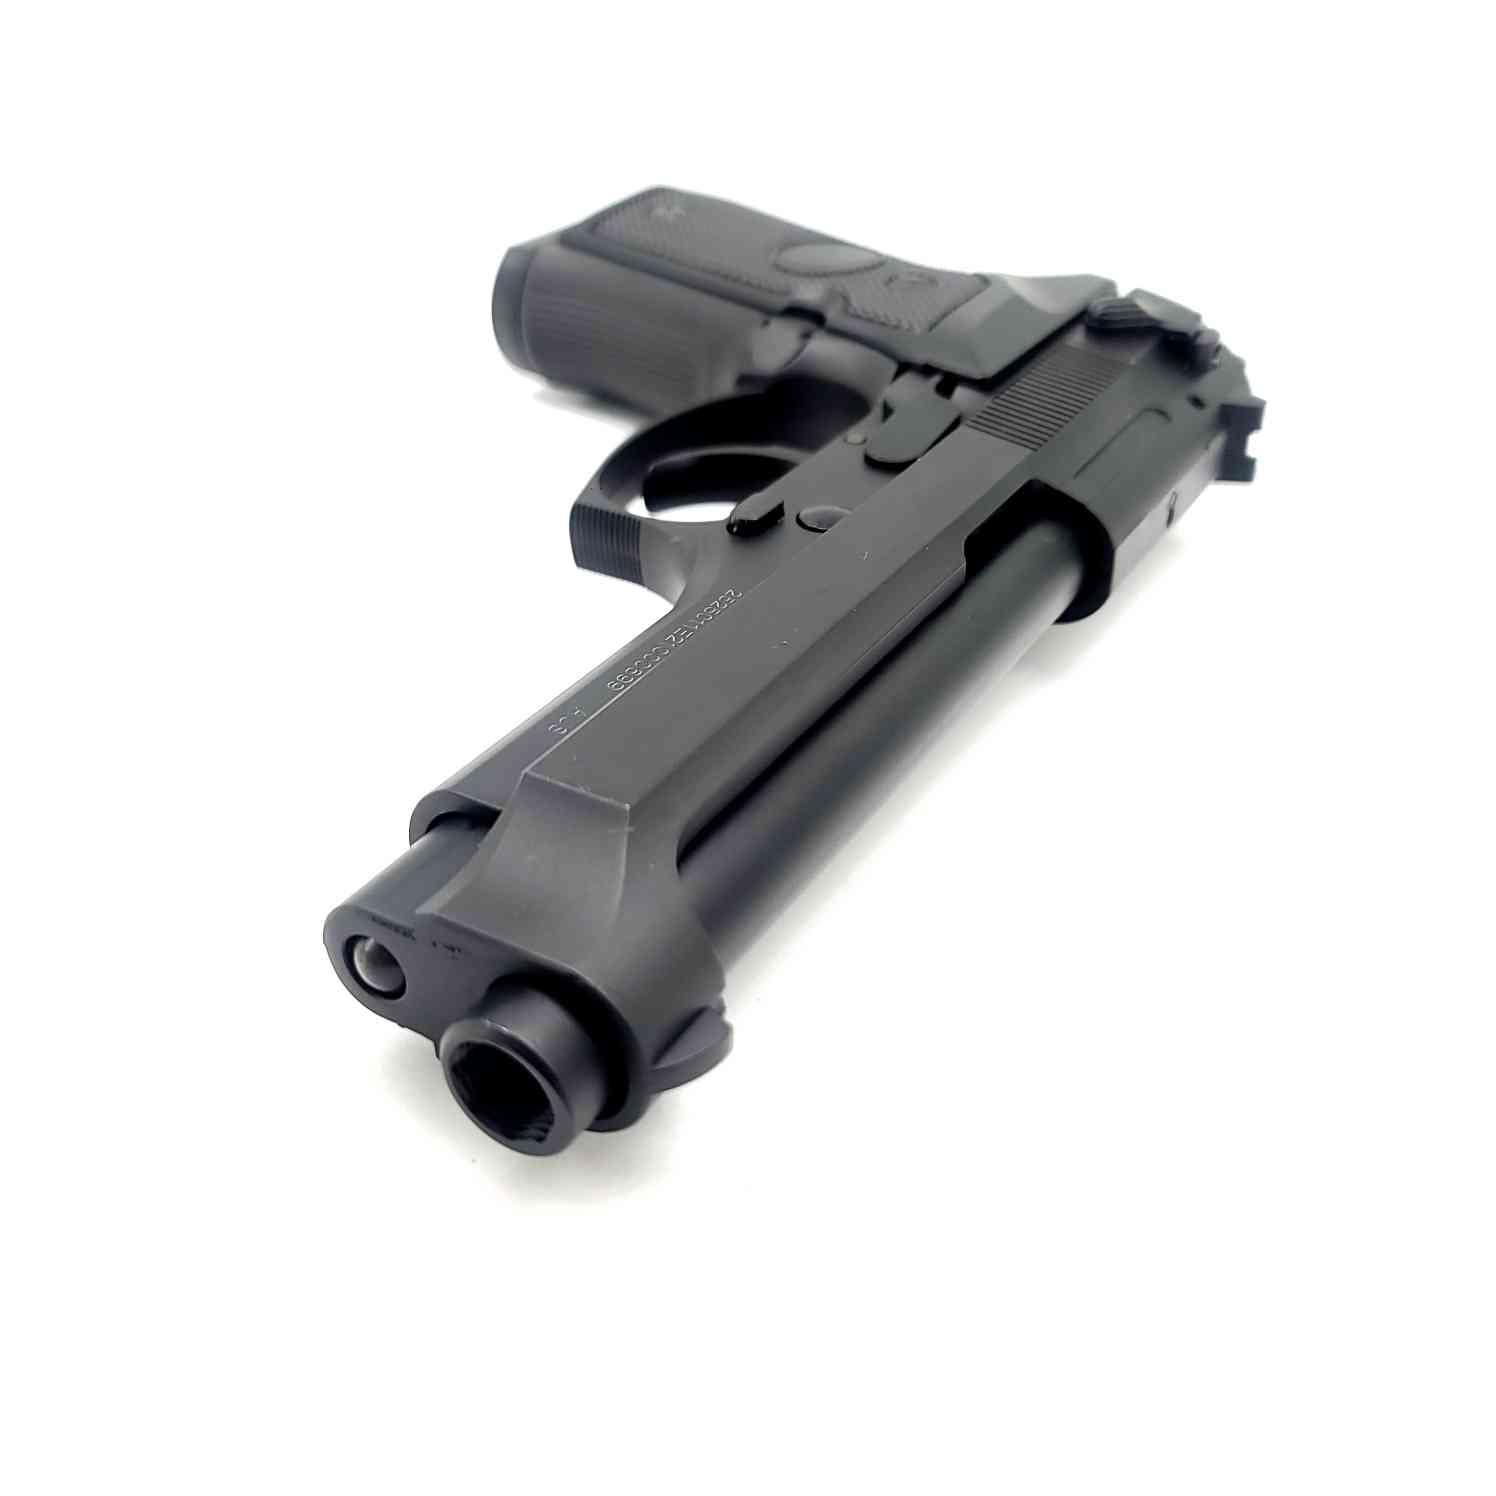 NWELL Beretta M92 Metal Gas Gel Blaster [PLAIN BLACK] Renegade Blasters